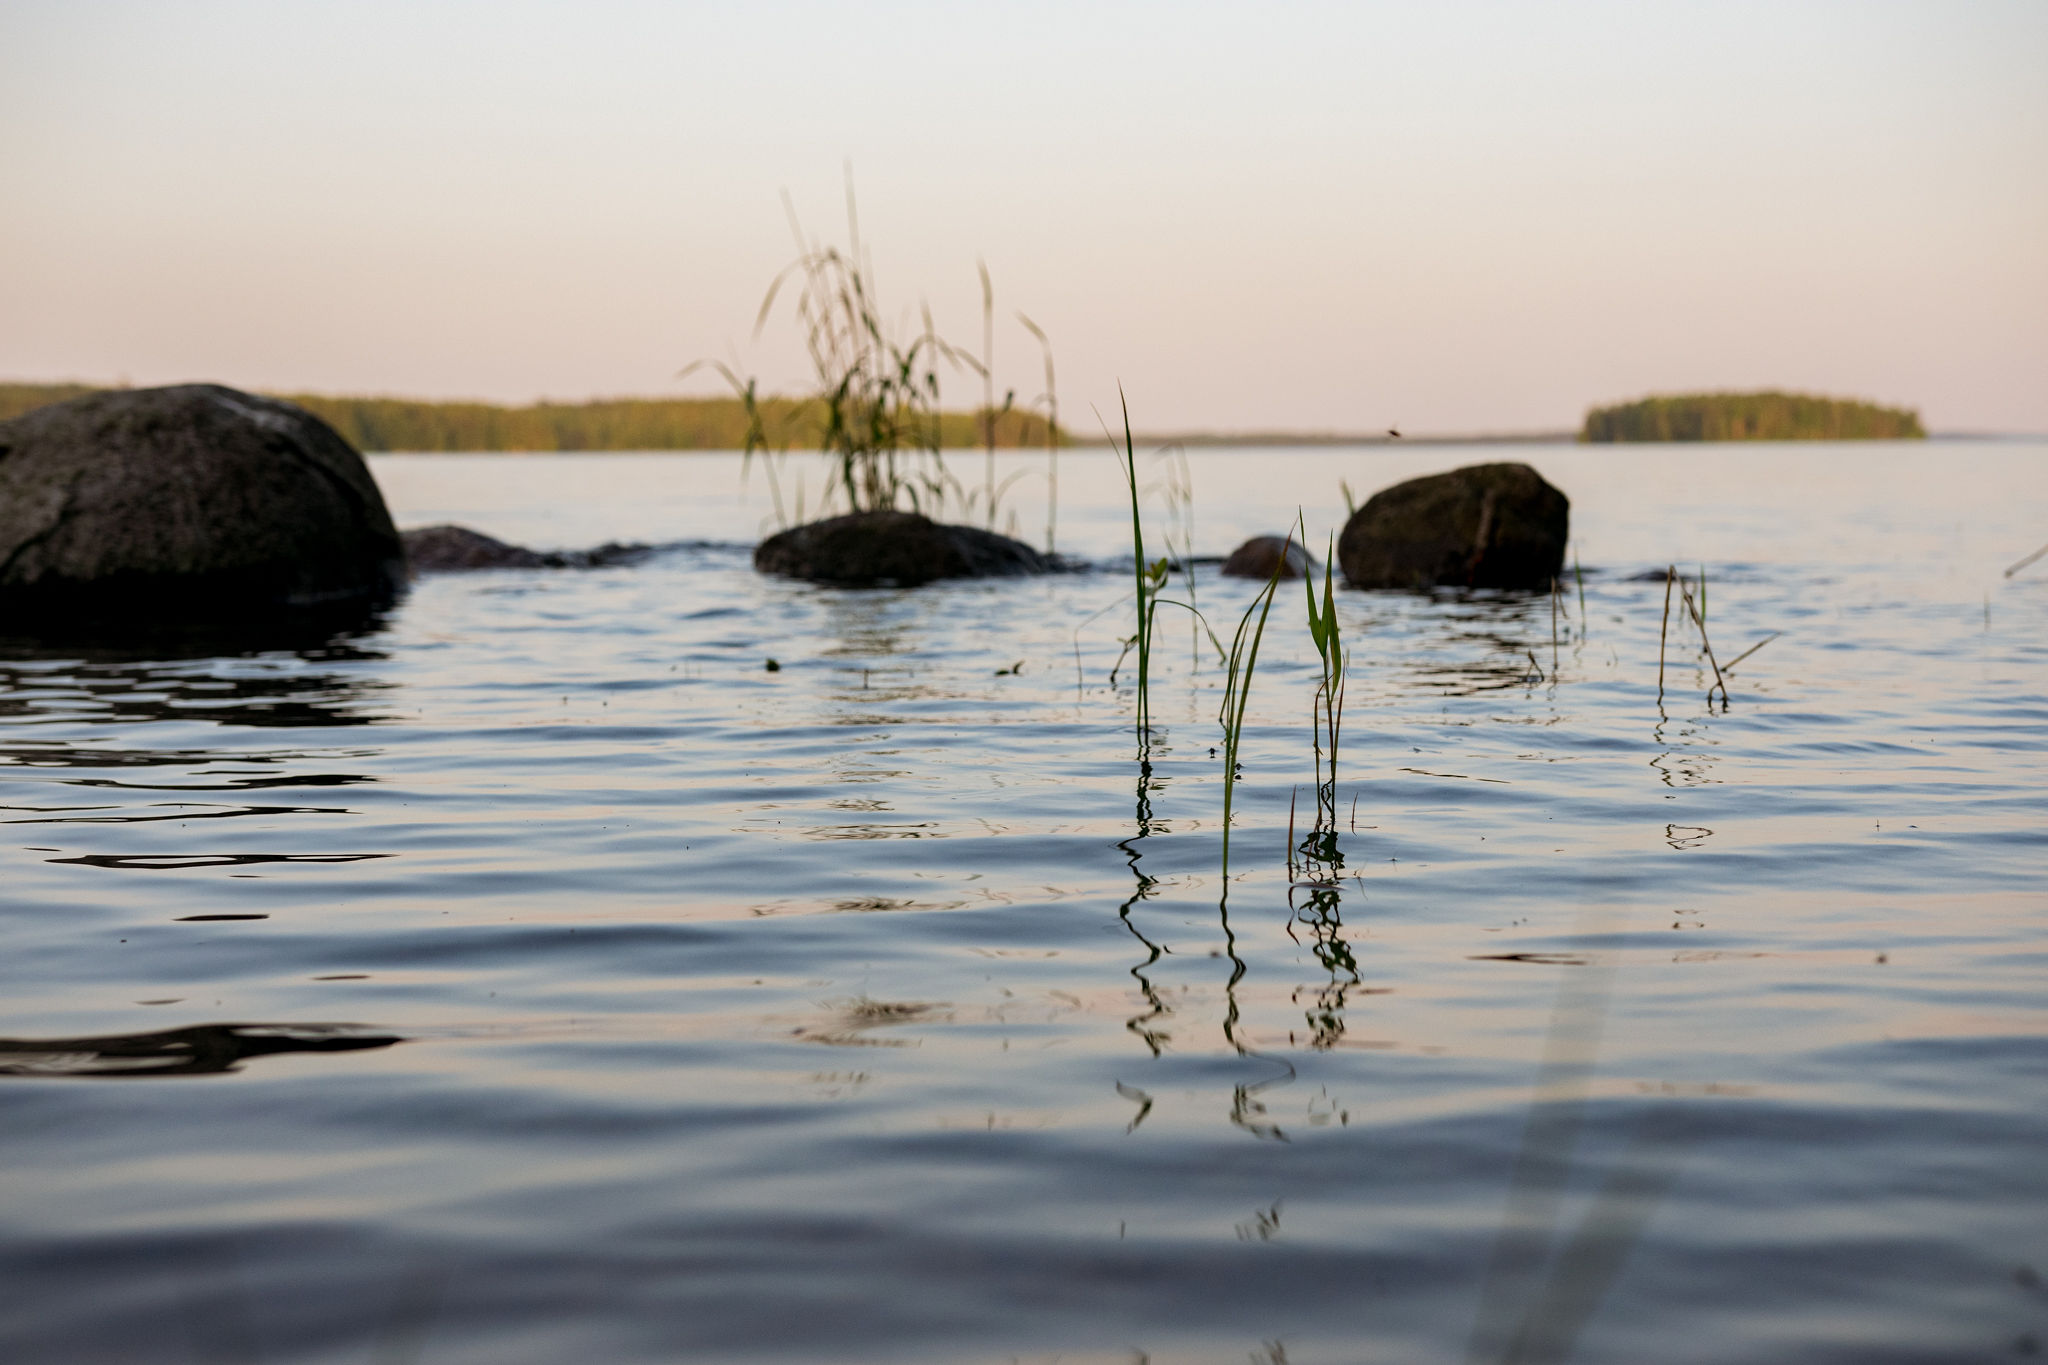 calm summer night in saimaa and finnish lakeland